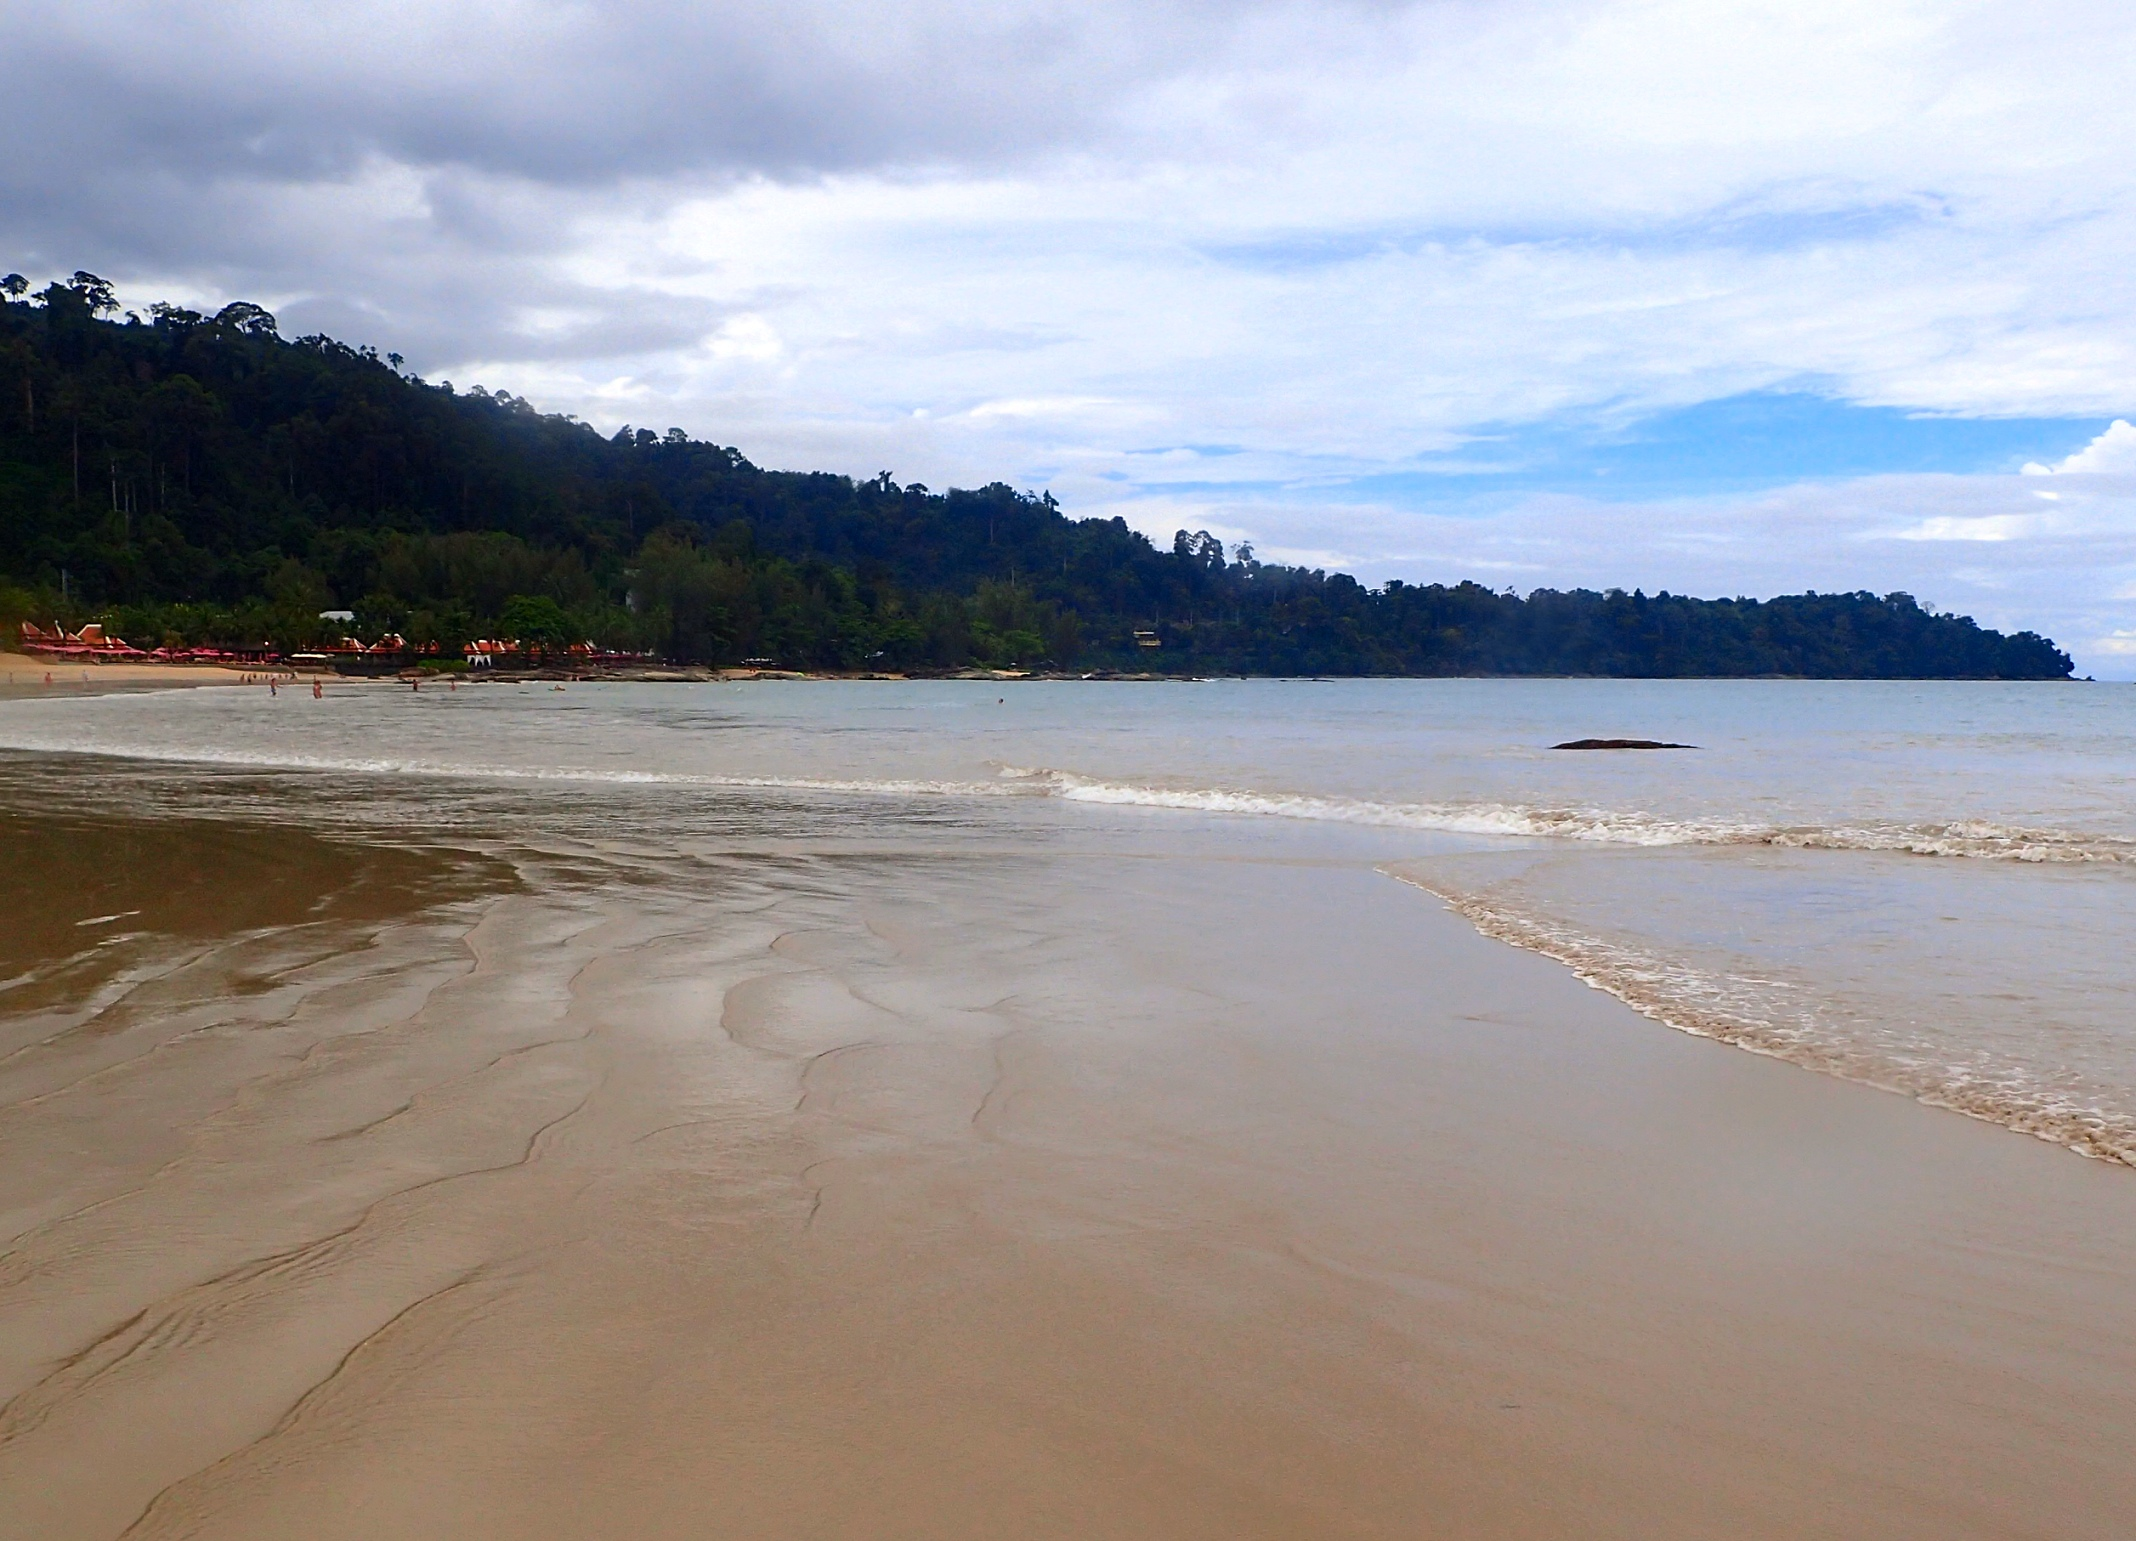 Nangthong beach